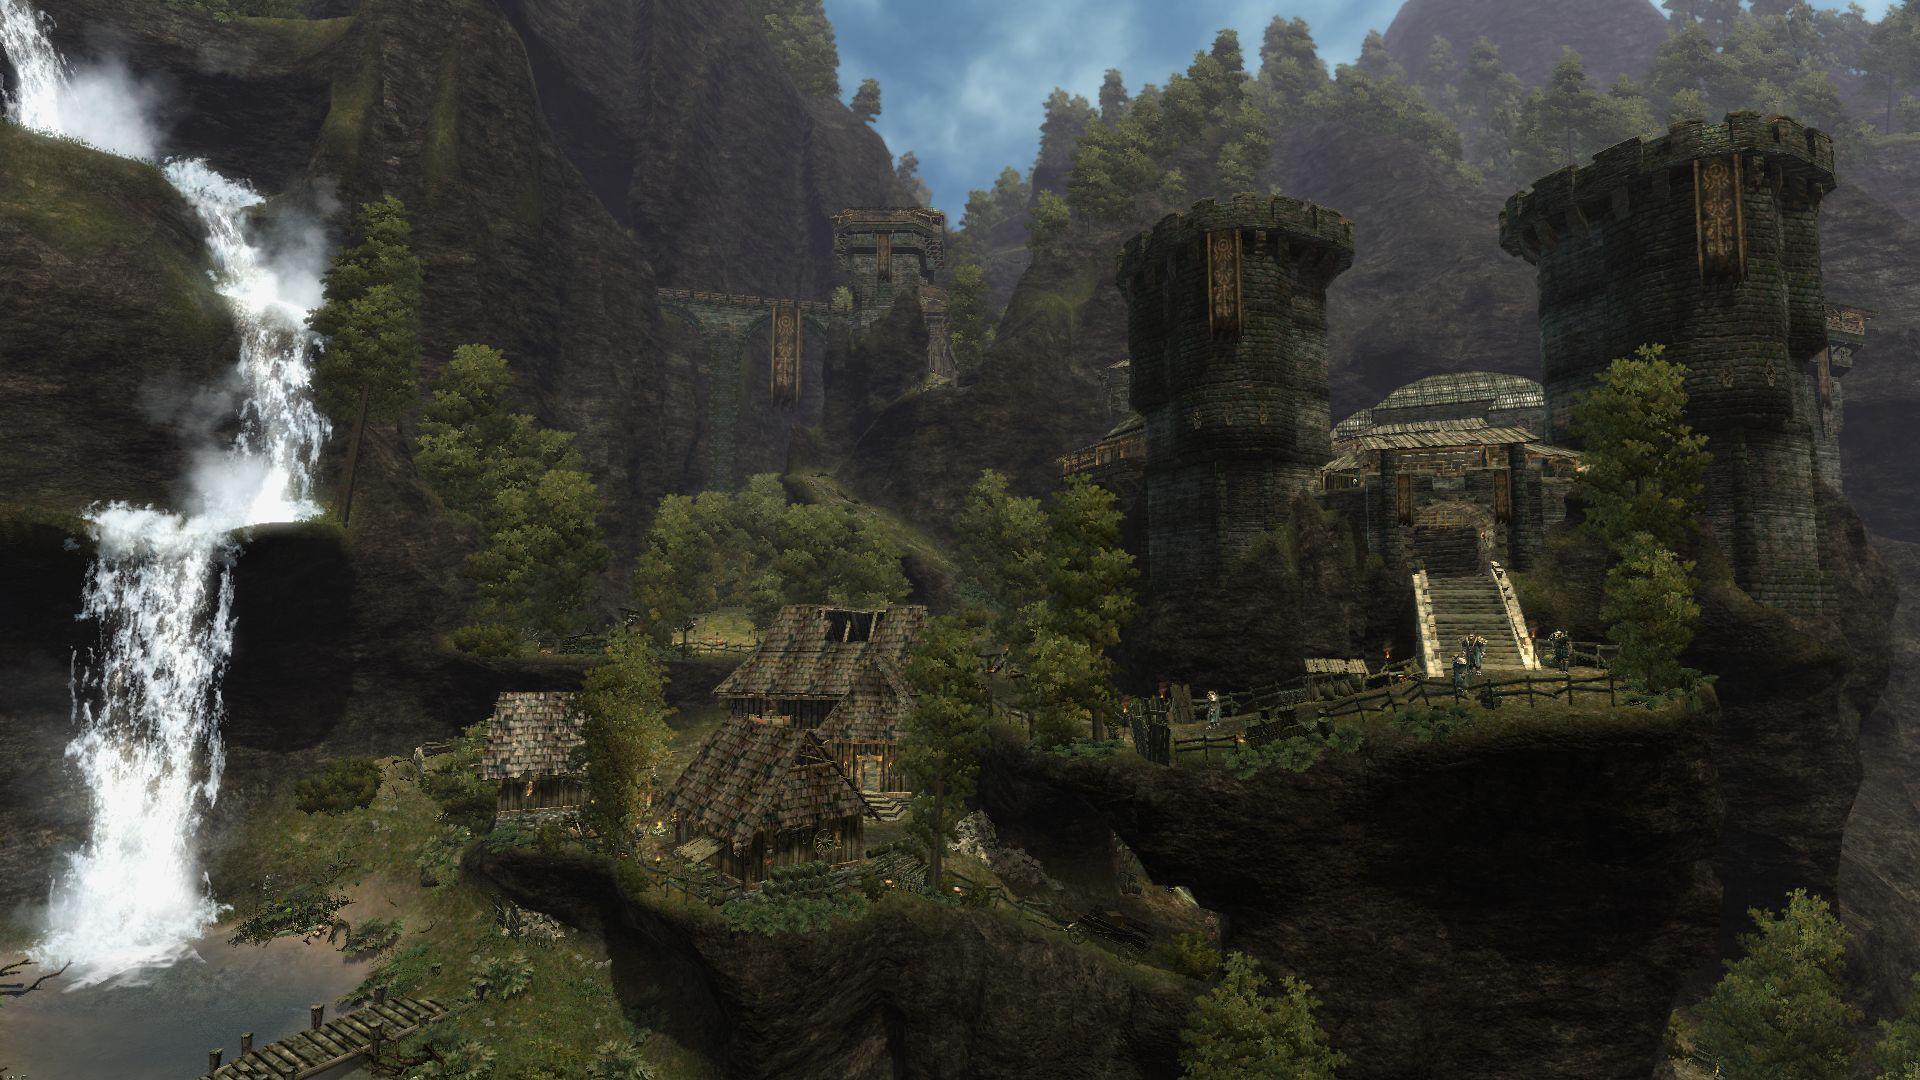 Фото пейзажей из готики